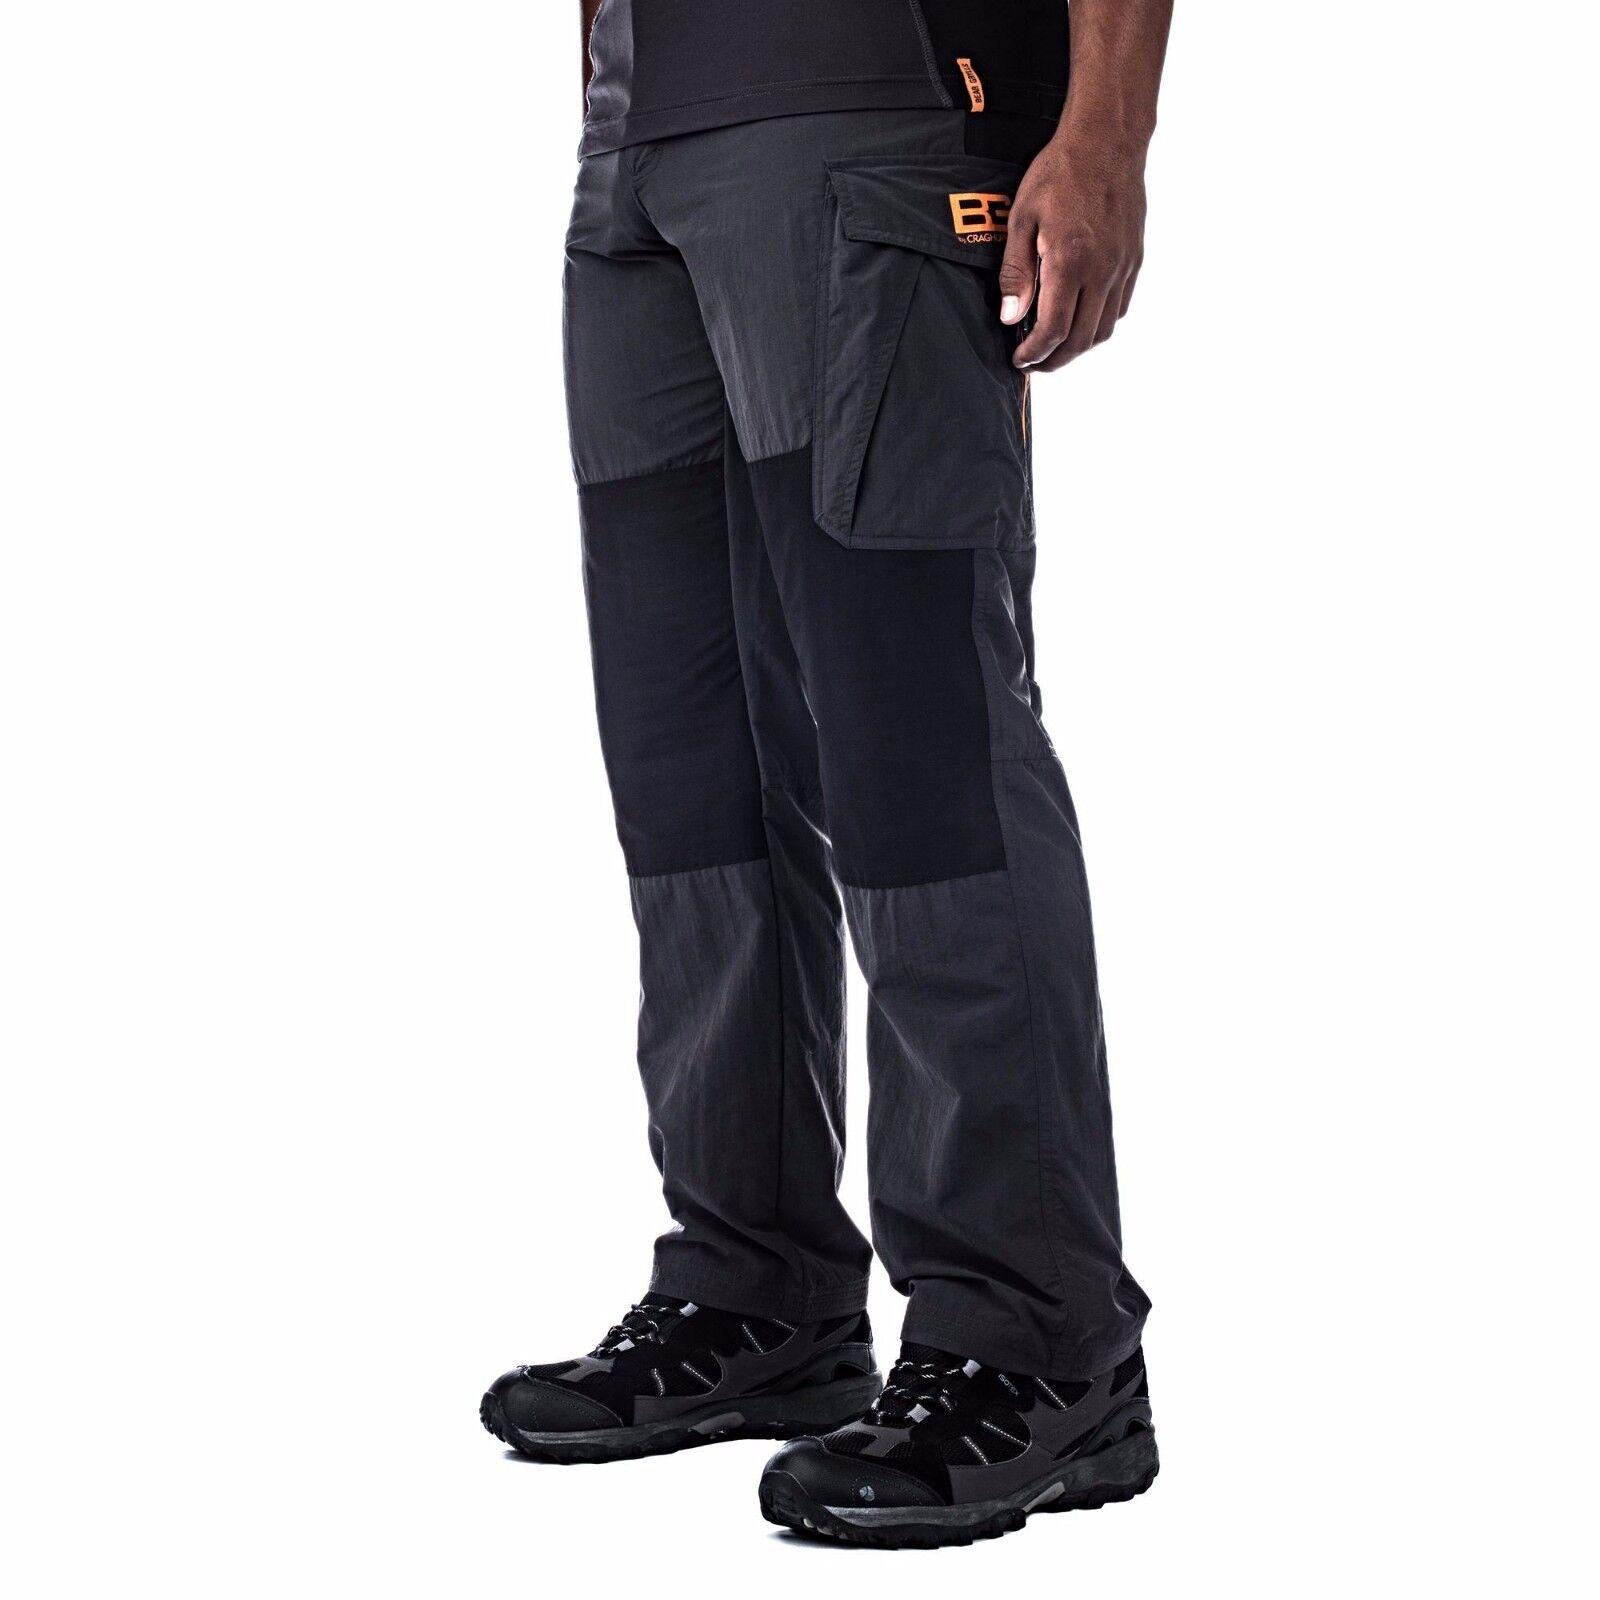 Bear Grylls Uomo Survivor Da passeggio Pantaloni CMJ392 Rambling